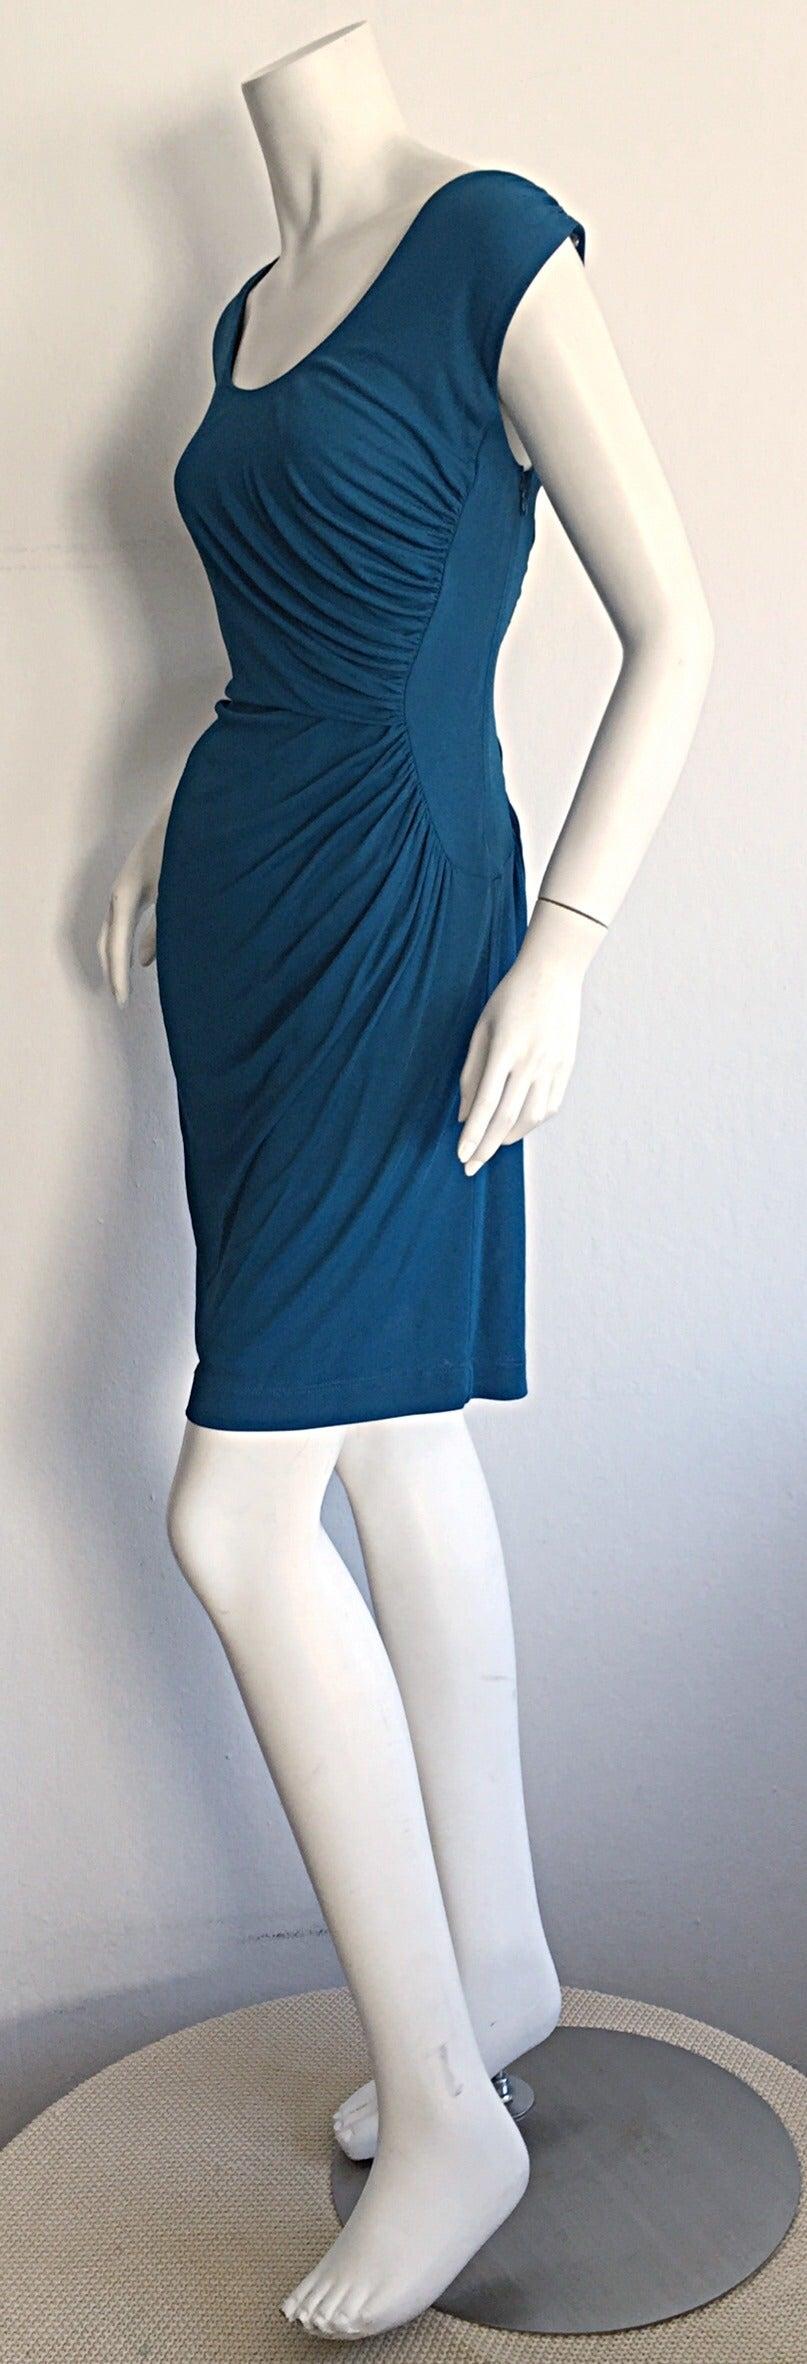 1990s Alberta Ferretti Size 6 / 8 Vintage Blue Jersey Draped Grecian Dress For Sale 1